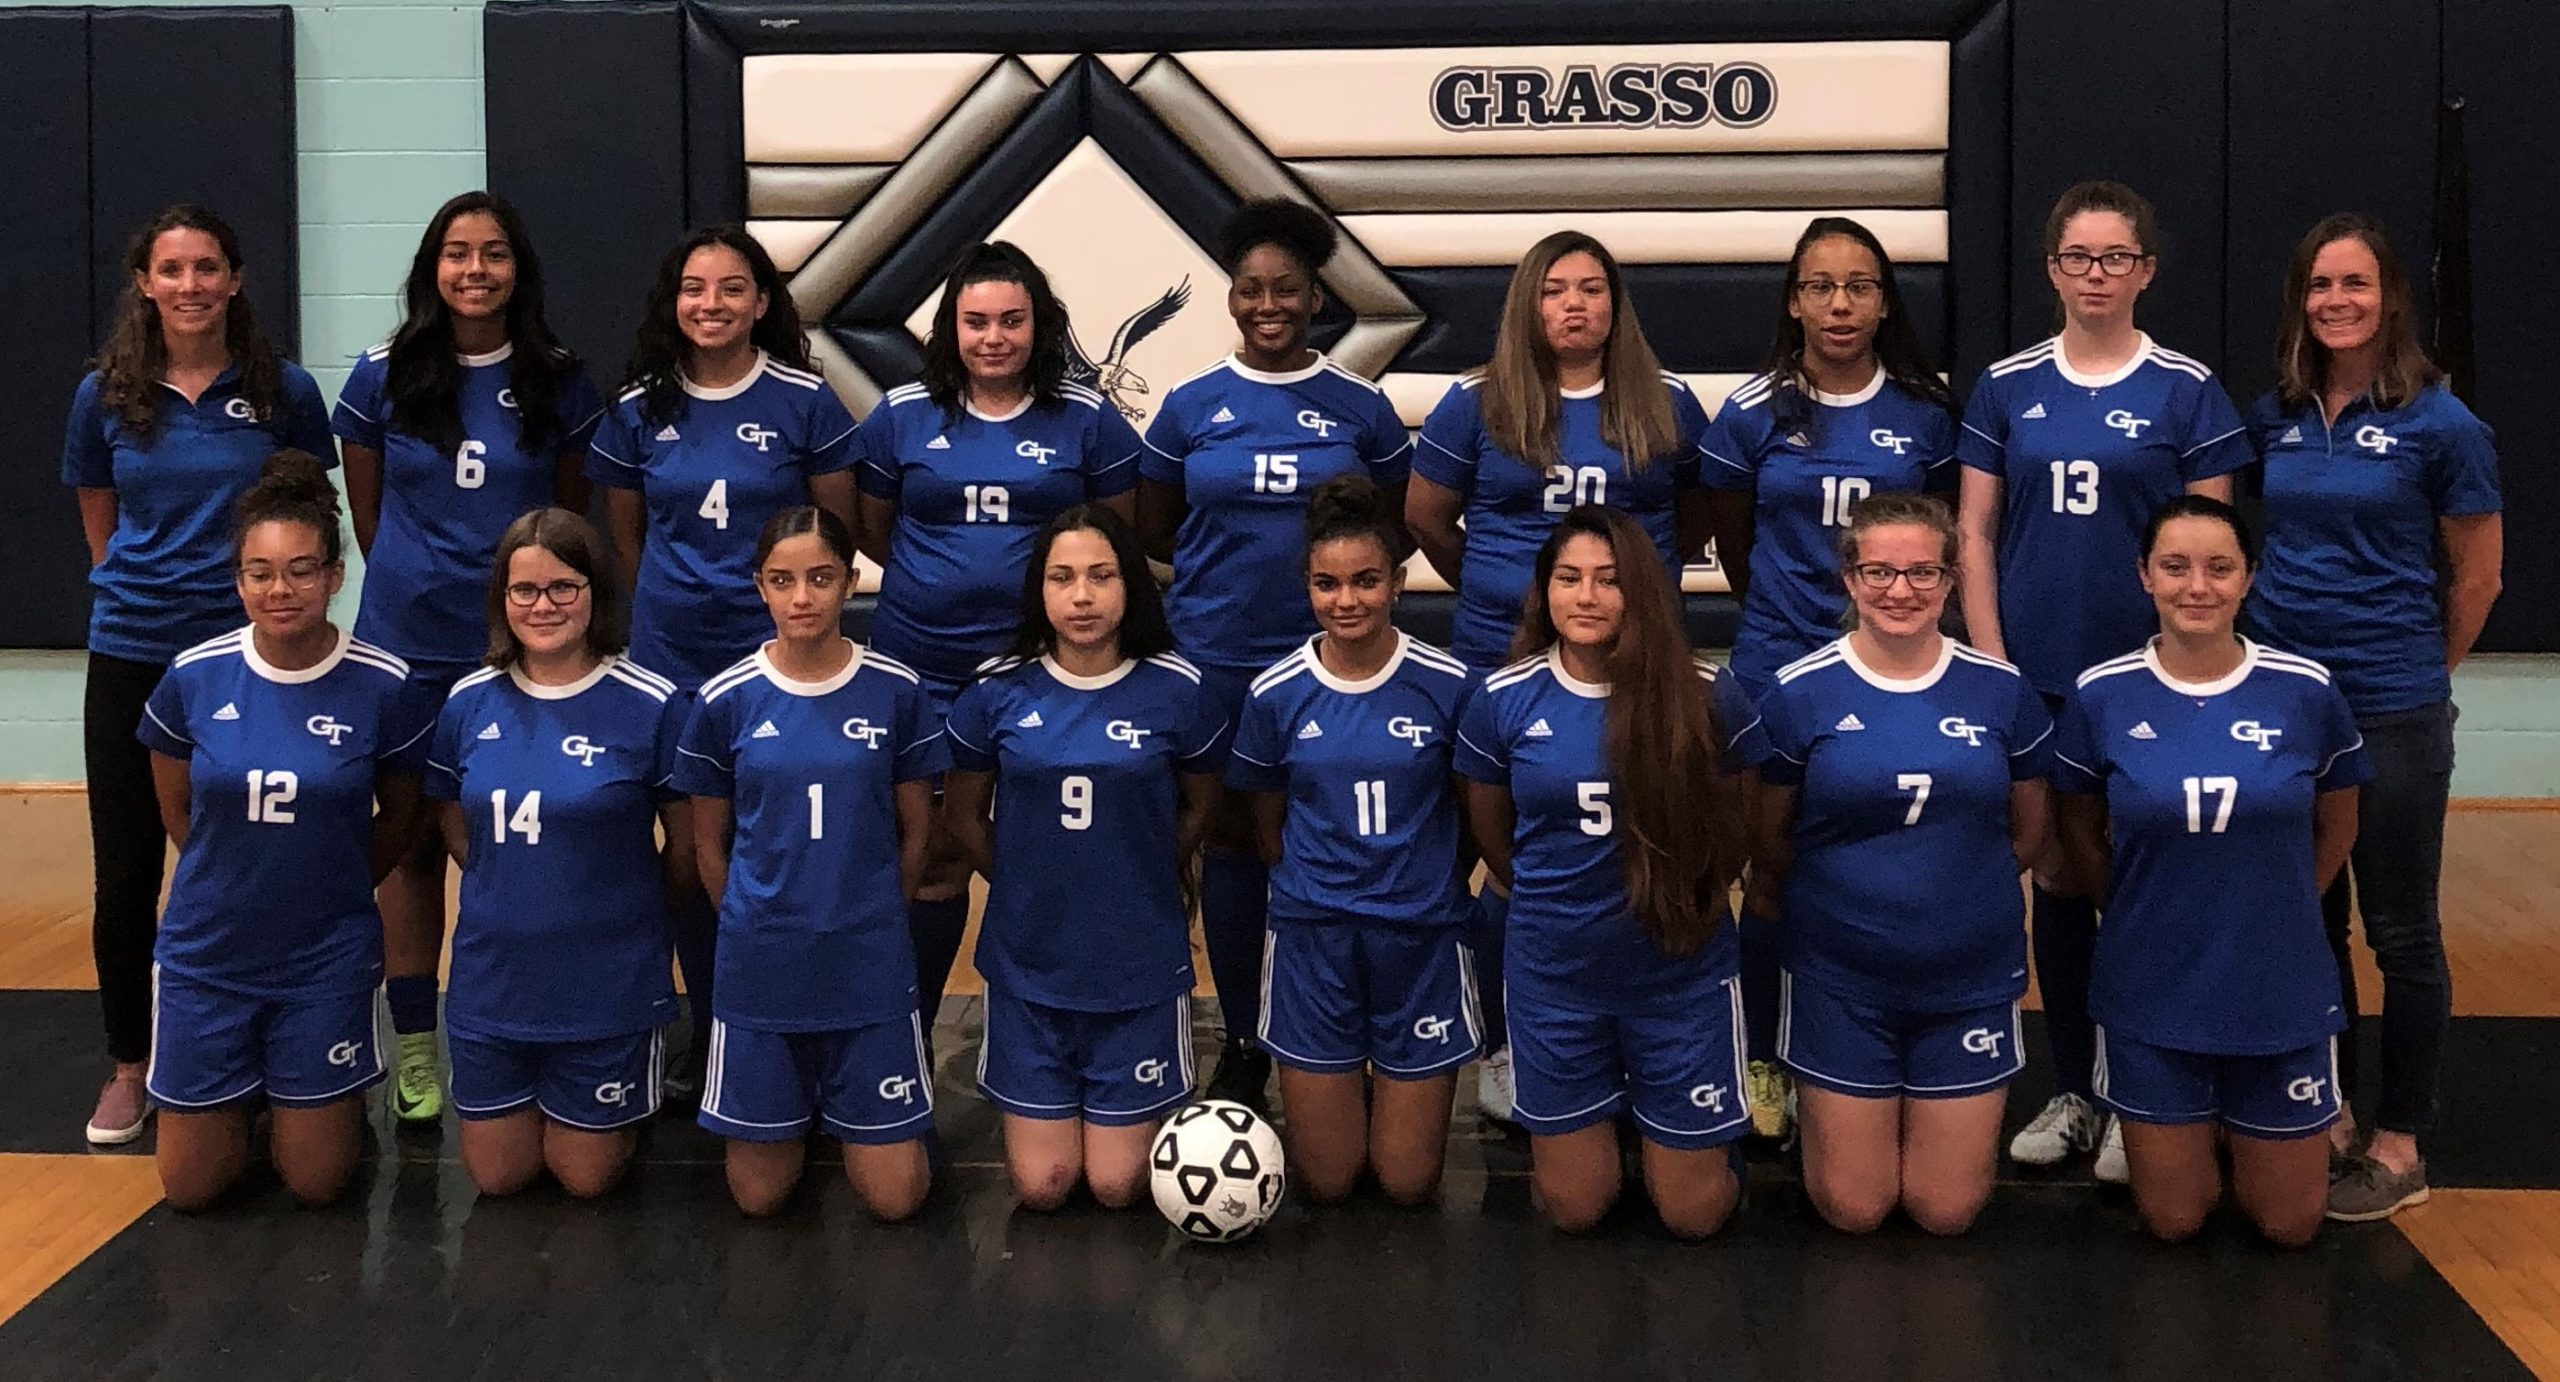 2020 Grasso Tech Girls Soccer Team Photo